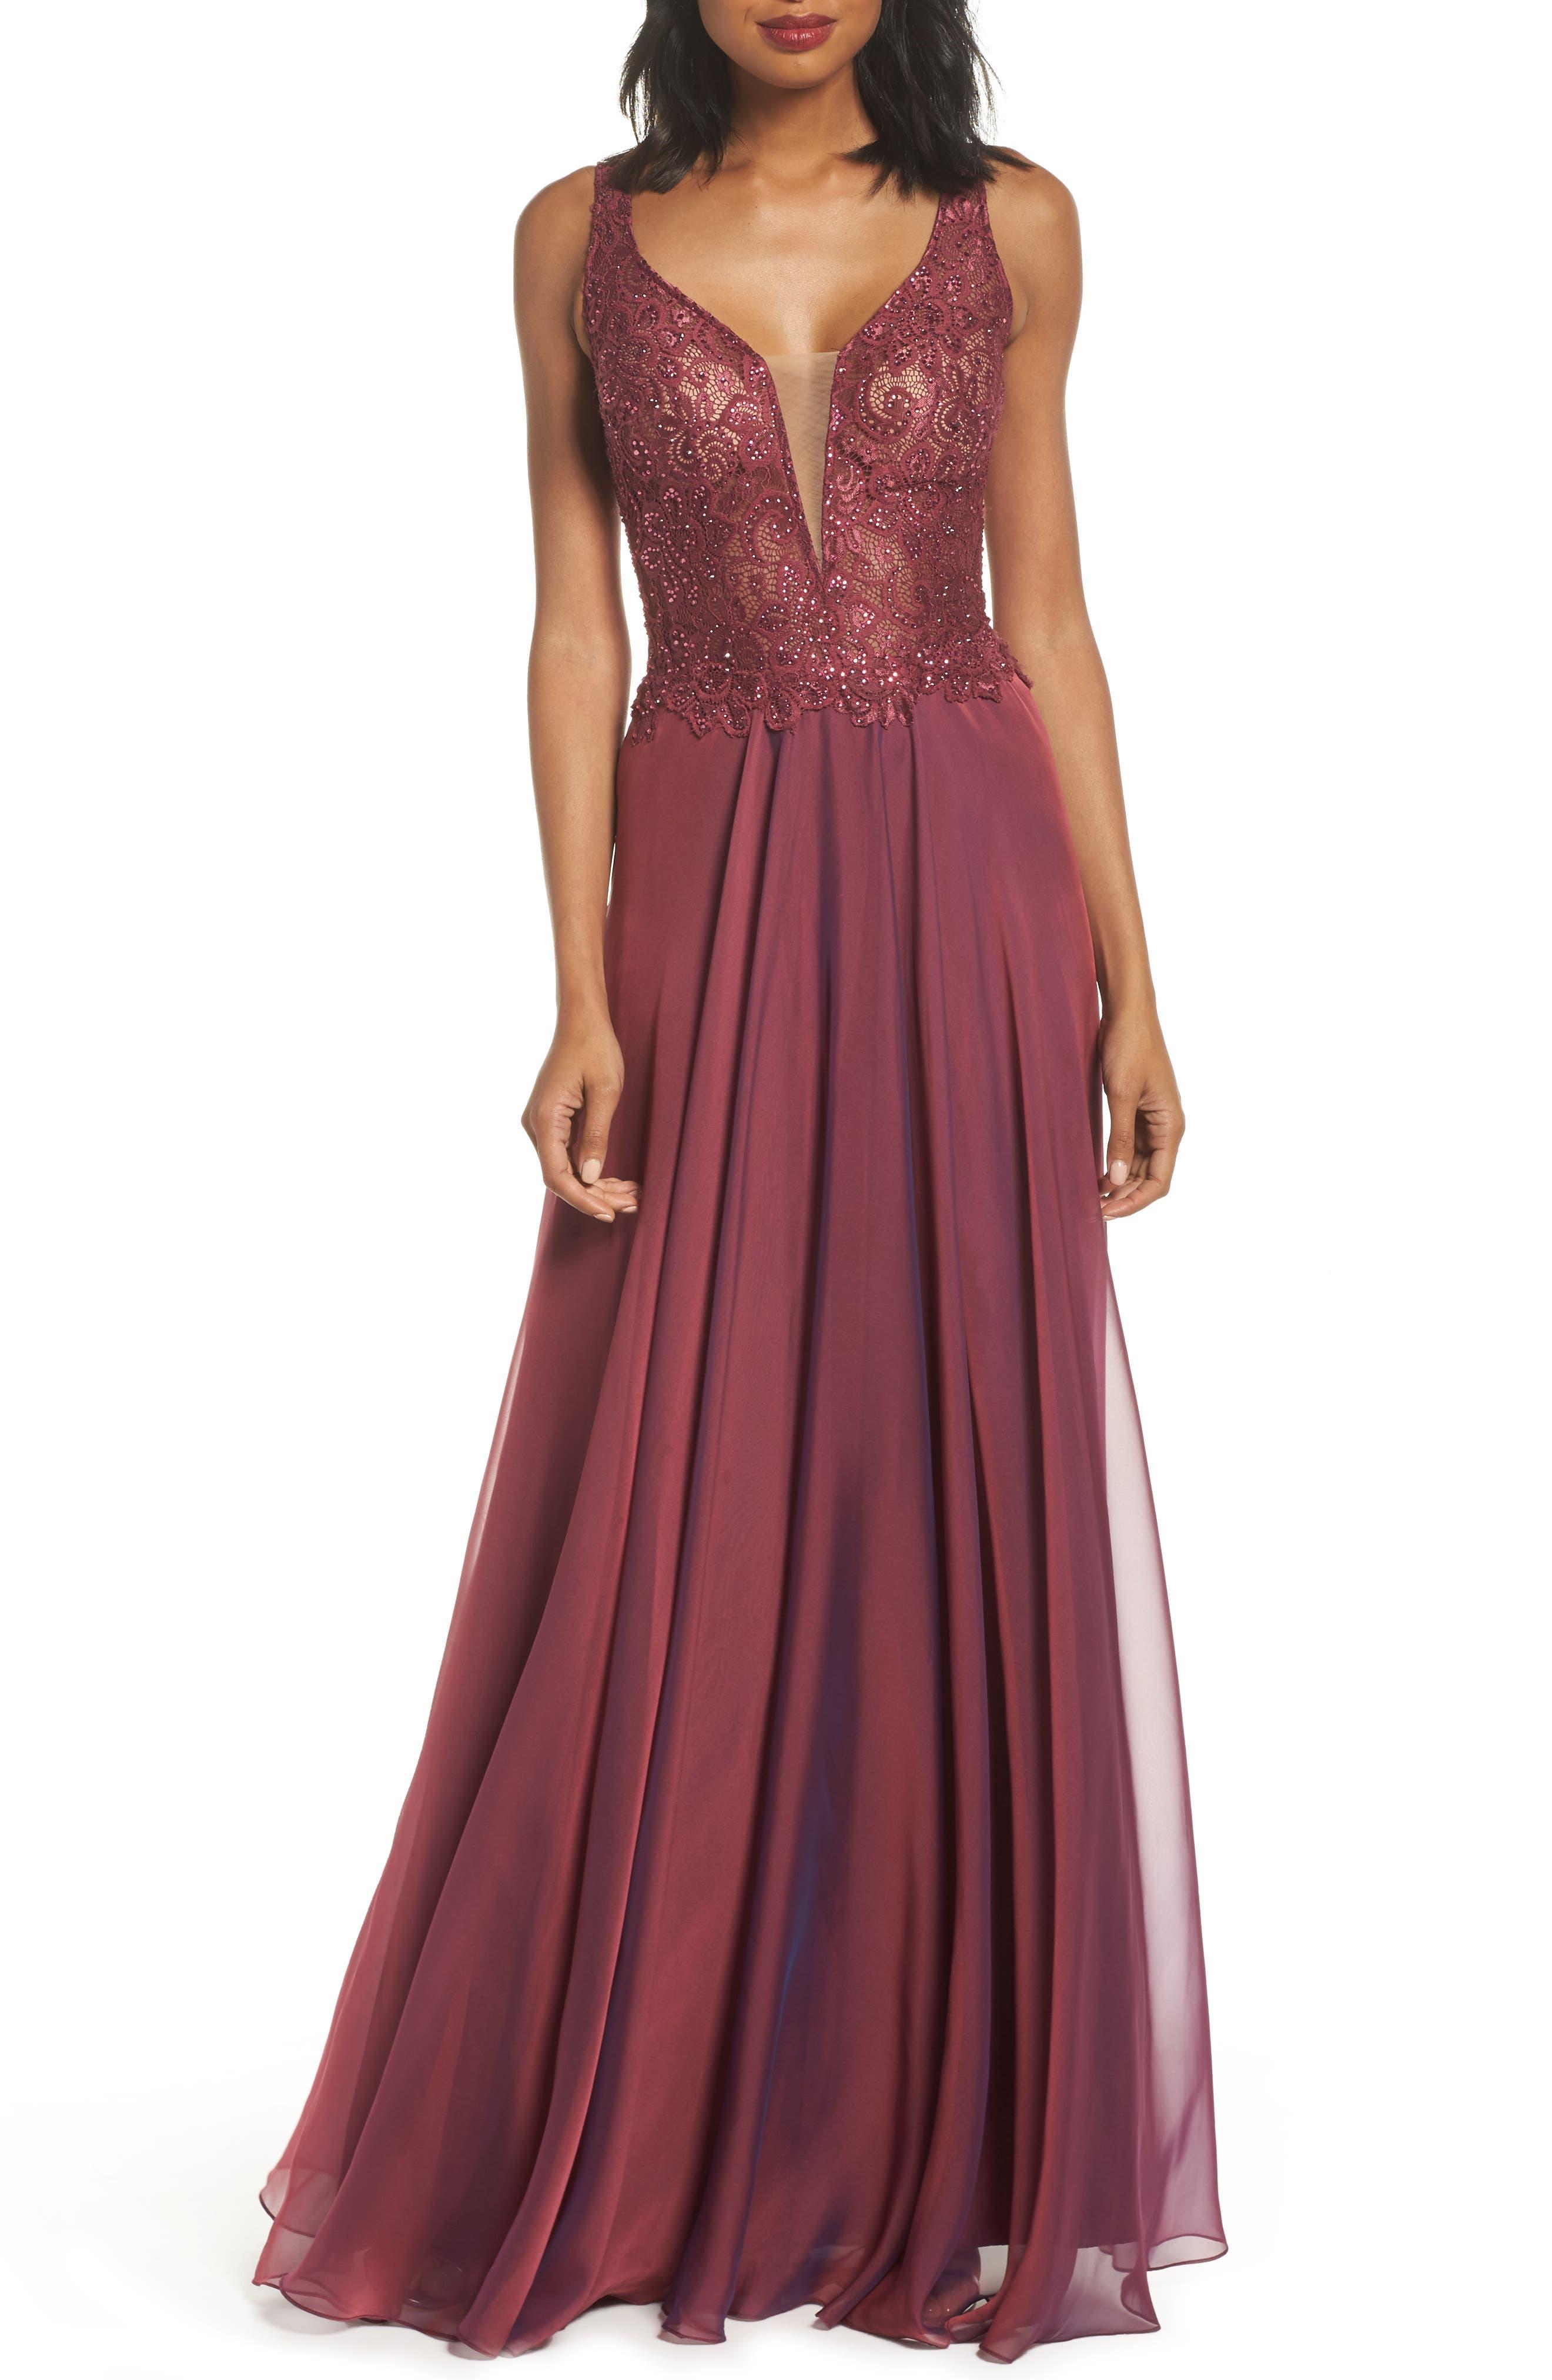 Alternate Image 1 Selected - La Femme Lace & Chiffon A-Line Gown